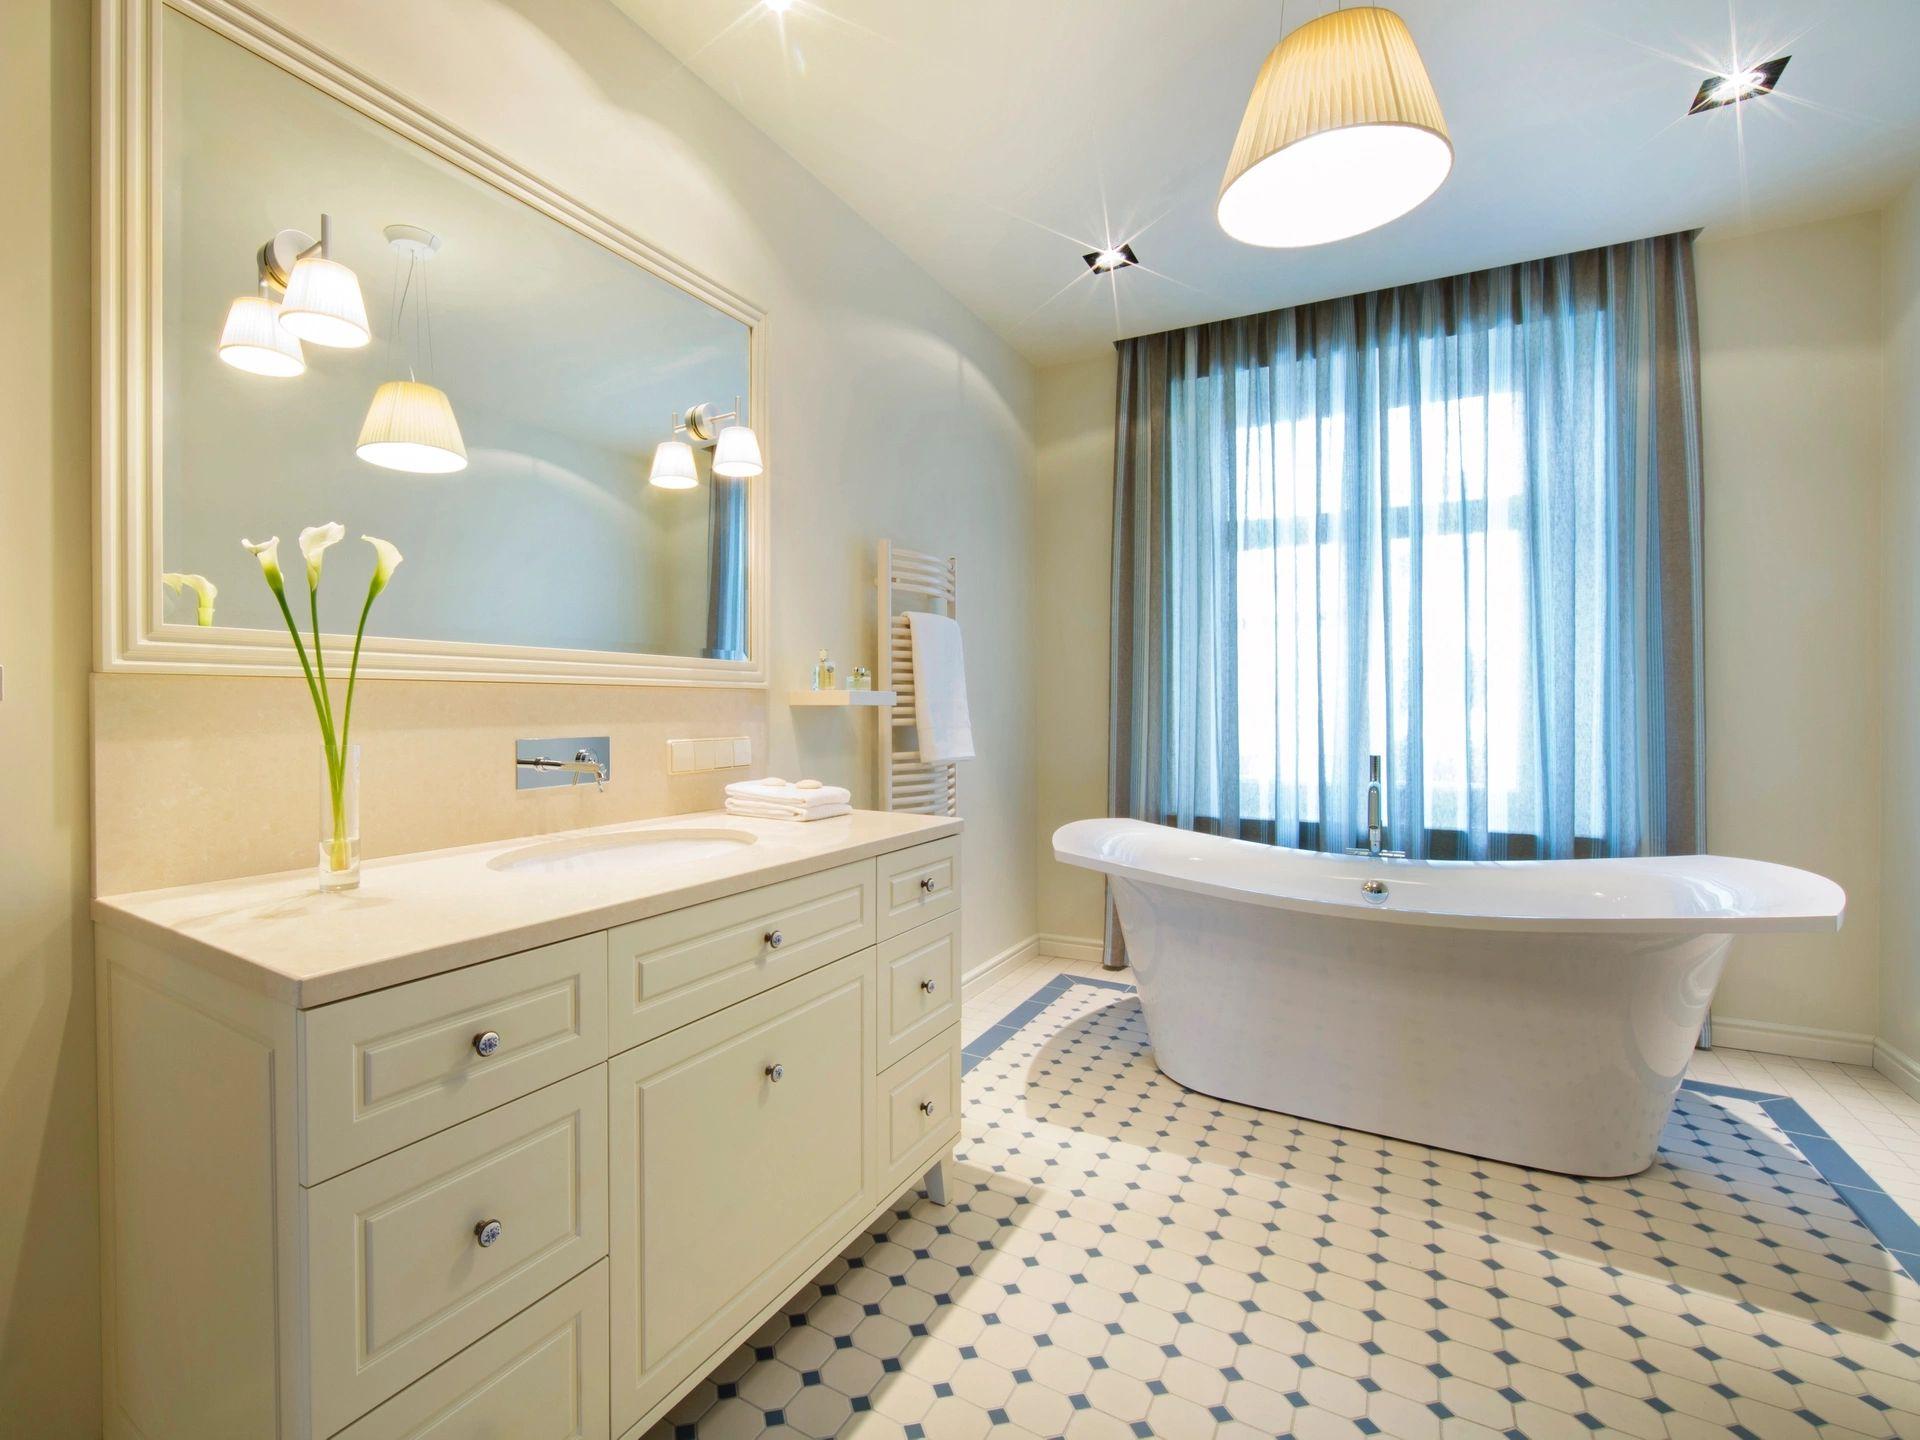 Have a nice clean bathroom